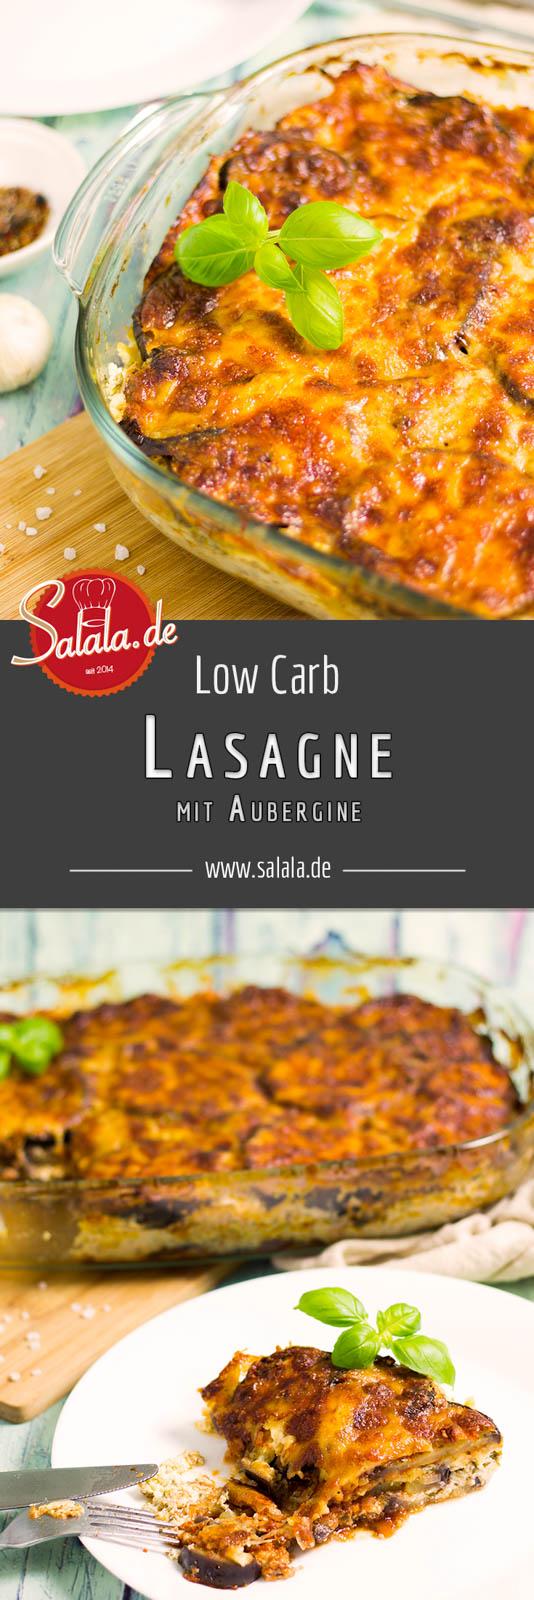 Auberginenlasagne selber machen - by salala.de - vegetarisches Low Carb Rezept ohne Nudeln